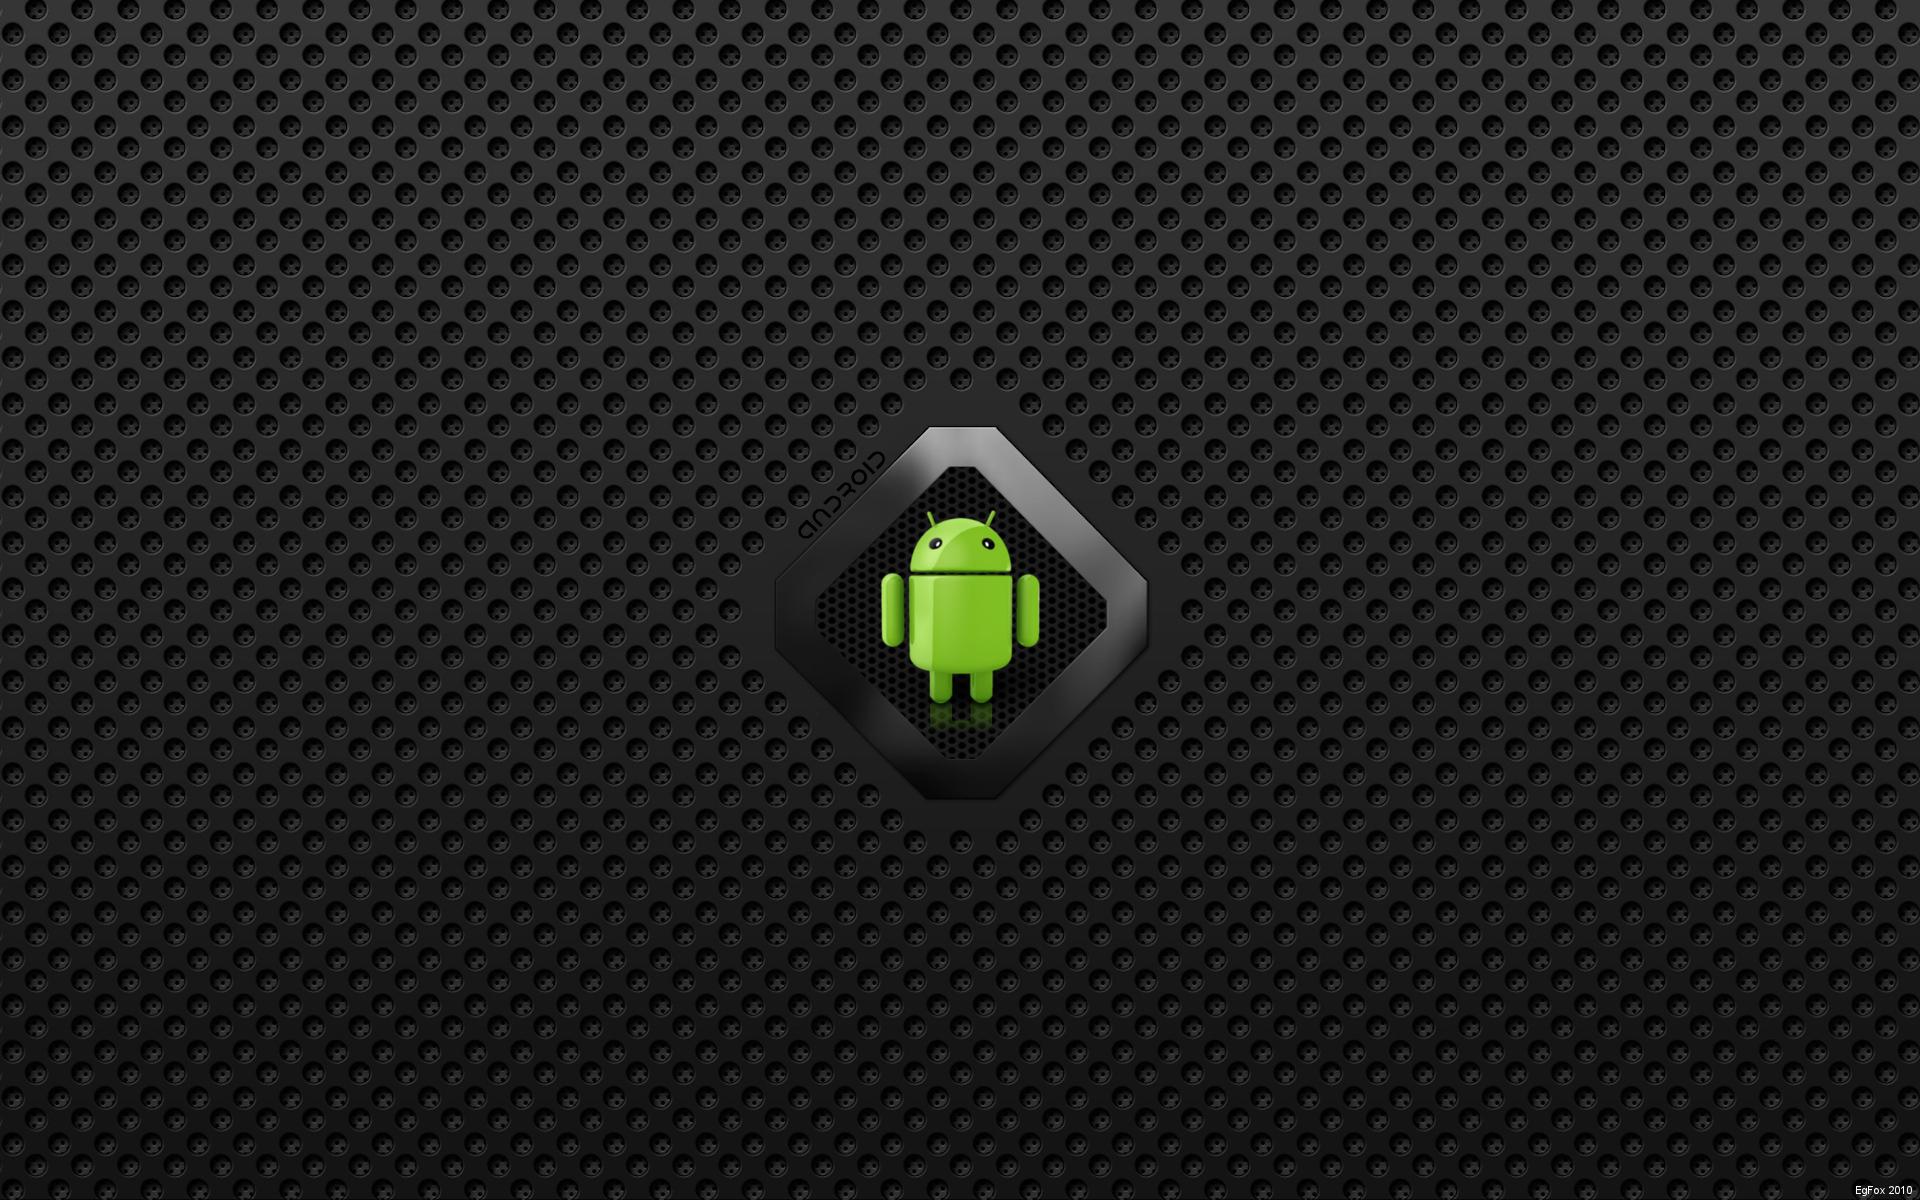 egfox android 2010 hd by eg art d31e53t Mükemmel HD Resimler